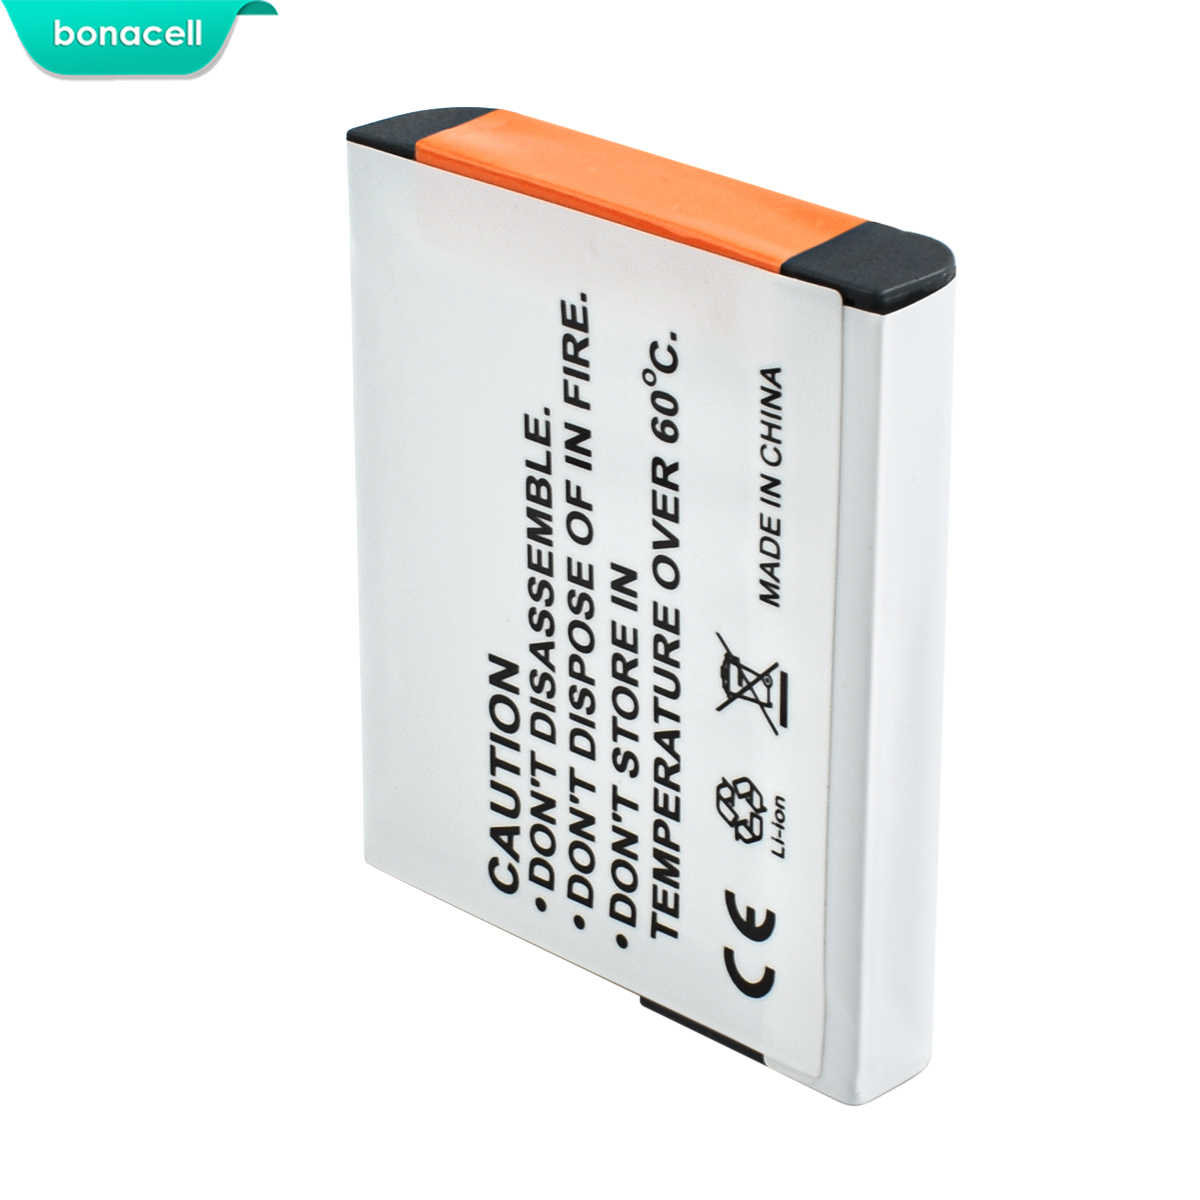 Bonacell 1800MAh NP-BG1 NP BG1 แบตเตอรี่สำหรับSONY Cyber-Shot DSC-H3 DSC-H7 DSC-H9 DSC-H10 DSC-H20 DSC-H50 DSC-H55 DSC-H70 l10